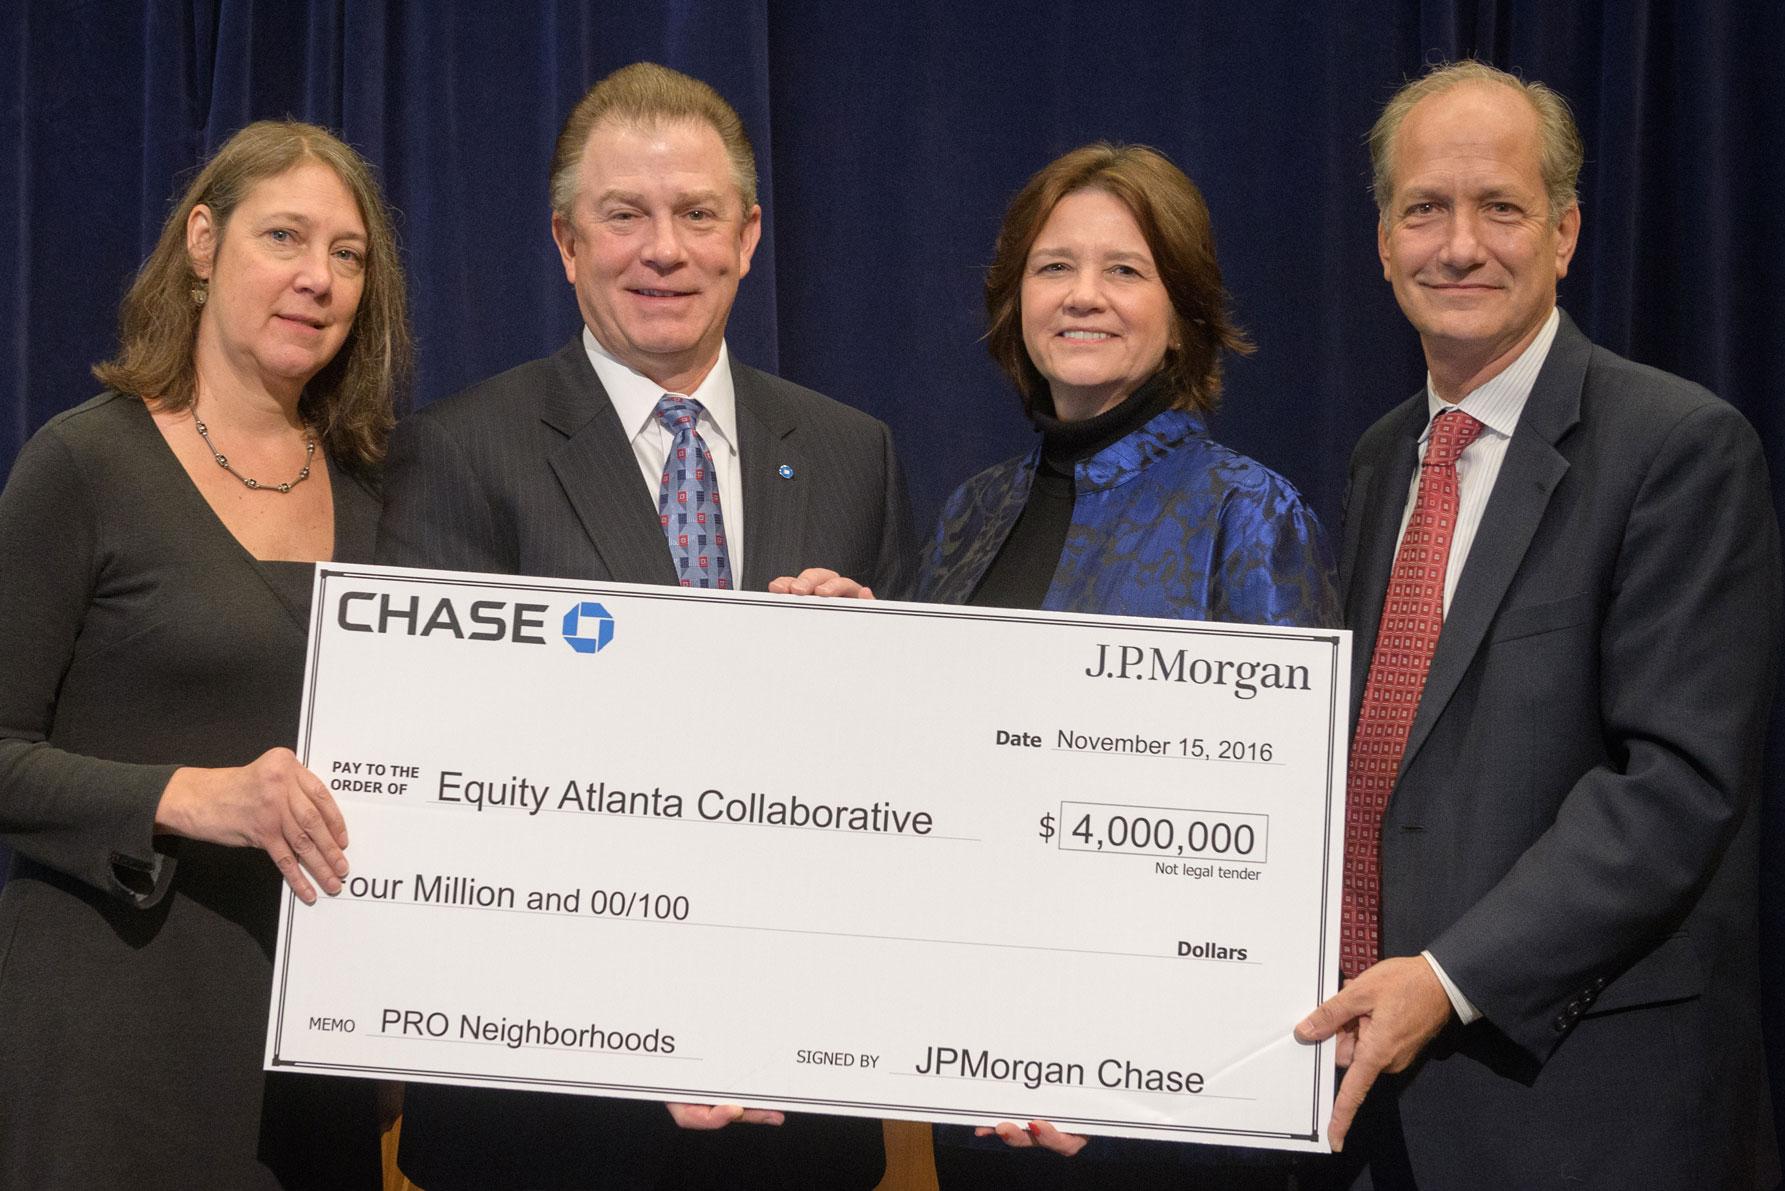 Equity Atlanta Collaborative Annoucement